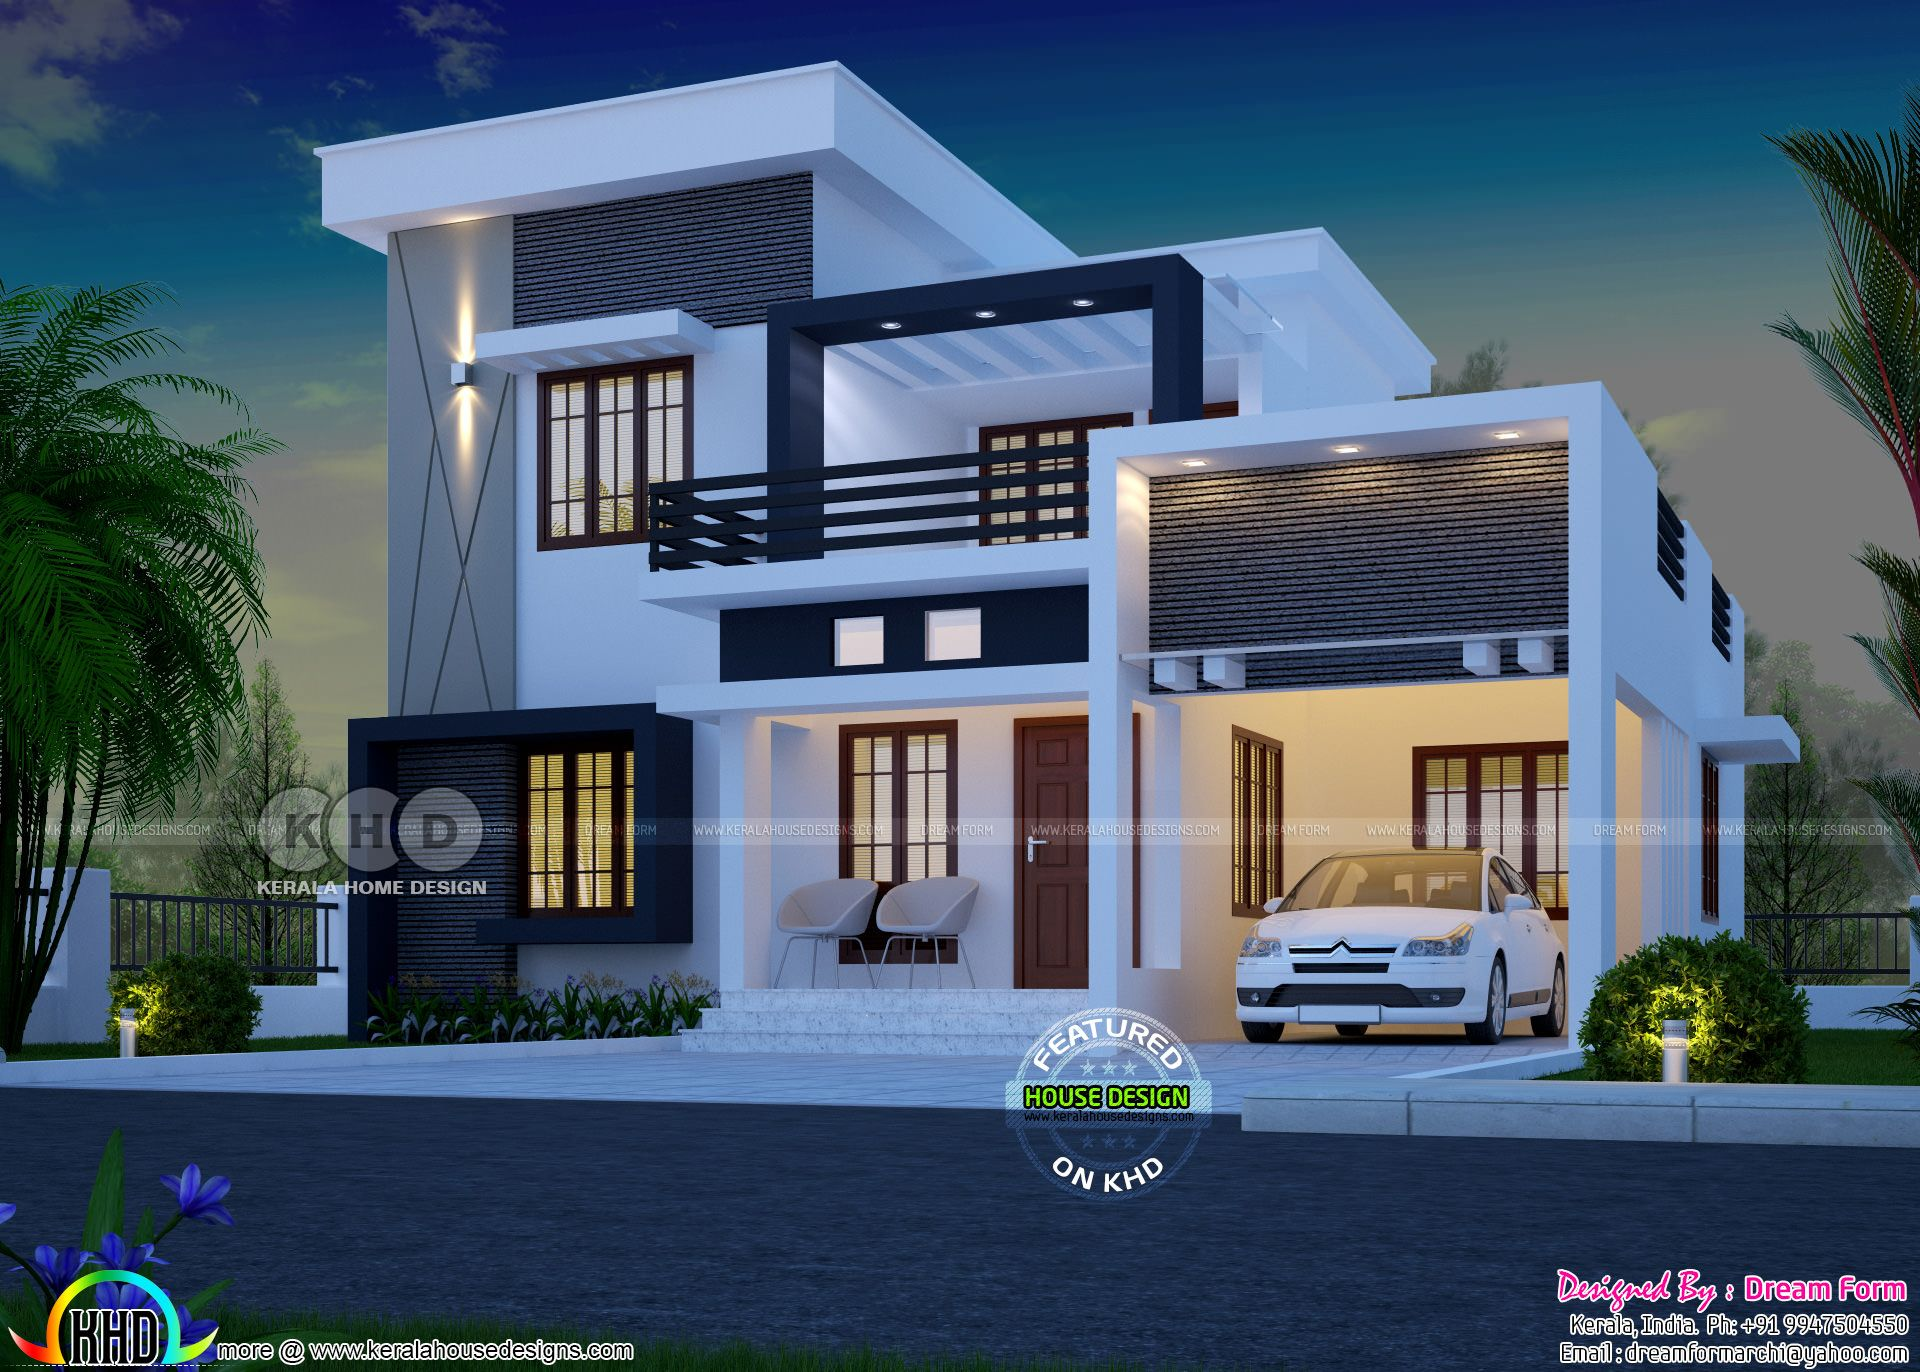 2018 Kerala Home Design And Floor Plans 2018 Kerala Home D Best Representatio Kerala House Design New Home Construction Small House Elevation Design